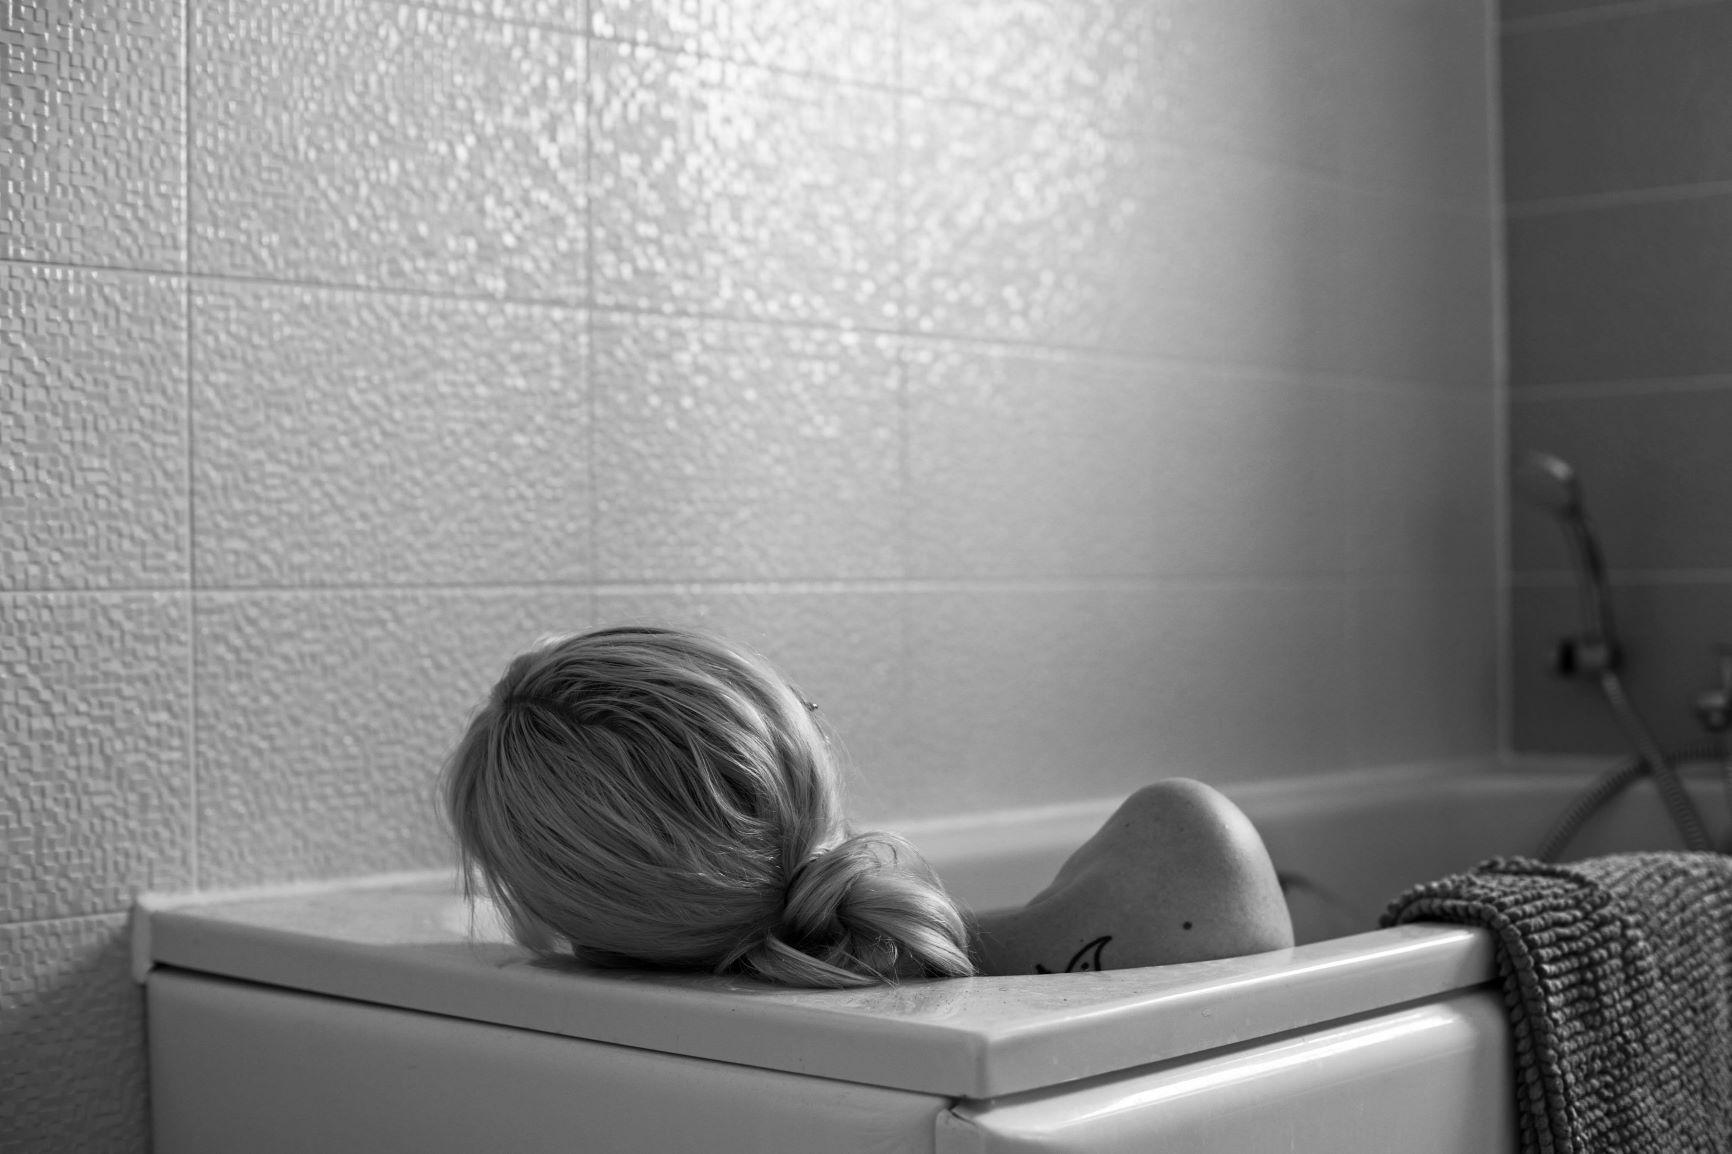 Portrait of Female figure in bath